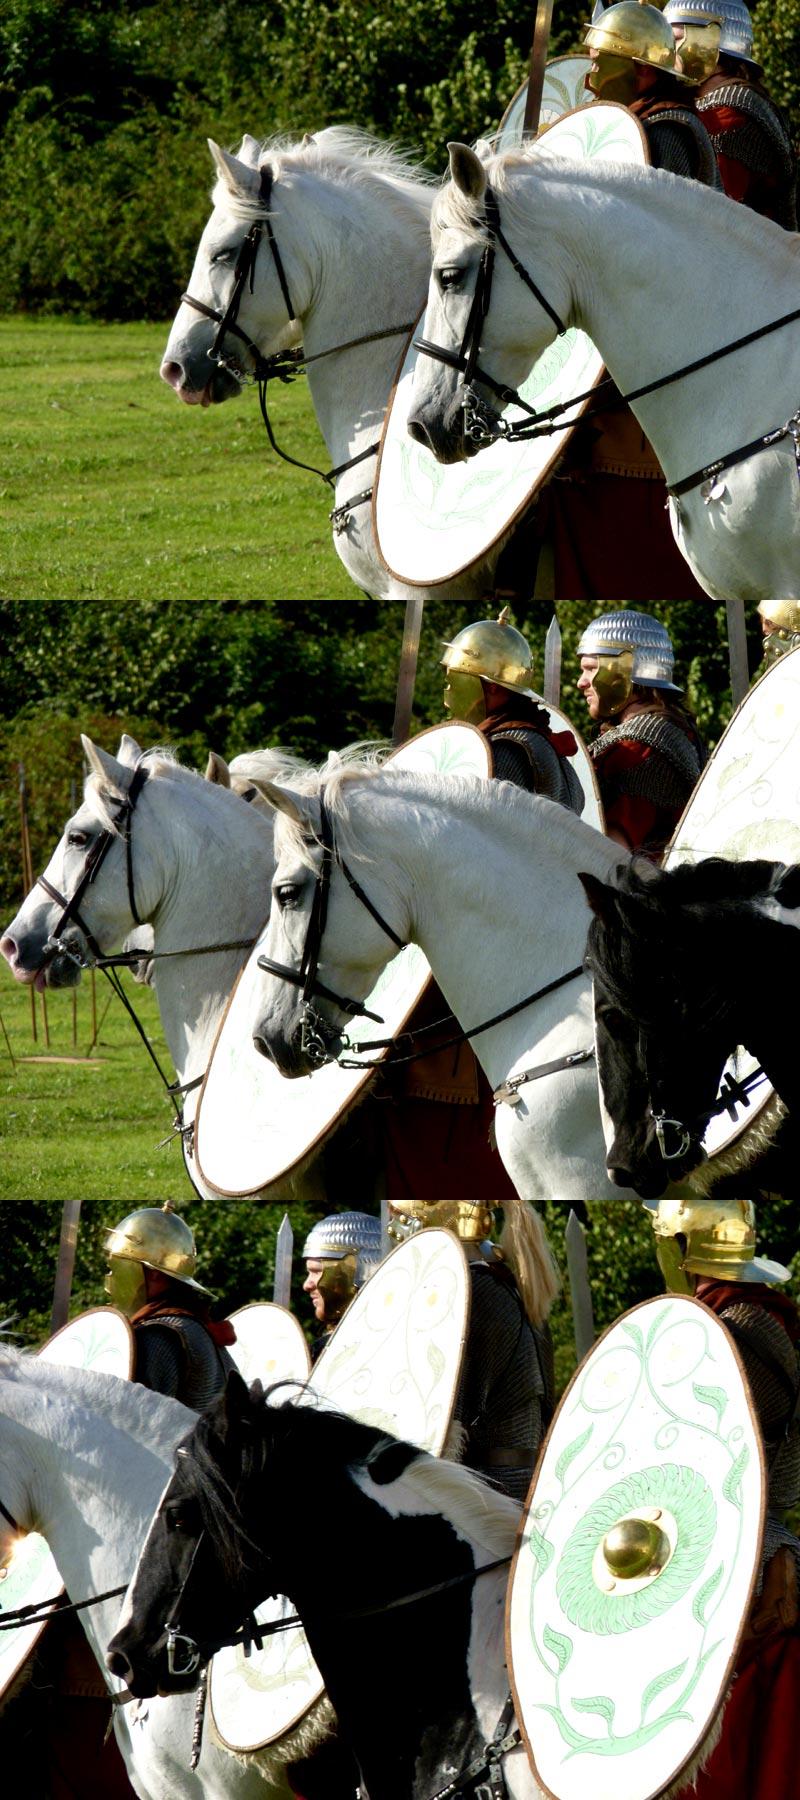 Roman soldier on horse